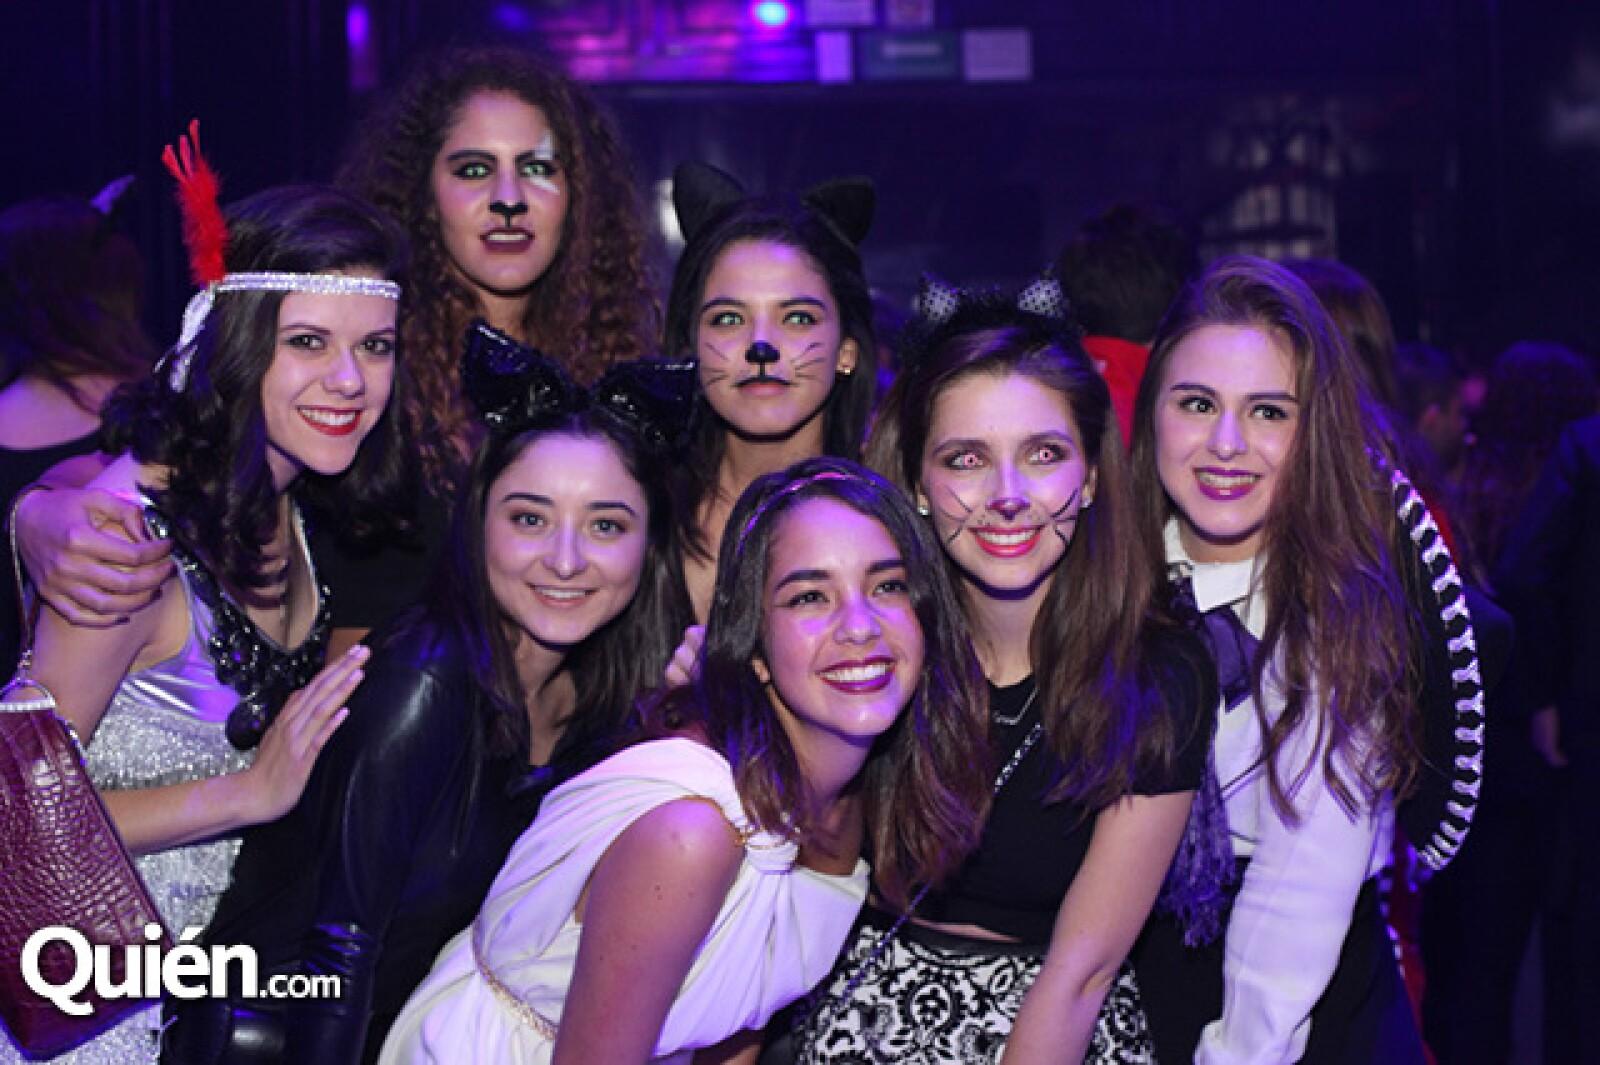 Ana Pau Bisogno,Mónica Magdub,Bárbara Besson,Daniela Díaz,Fernanda Arnaiz,Valeria Reta y Pamela Villegas